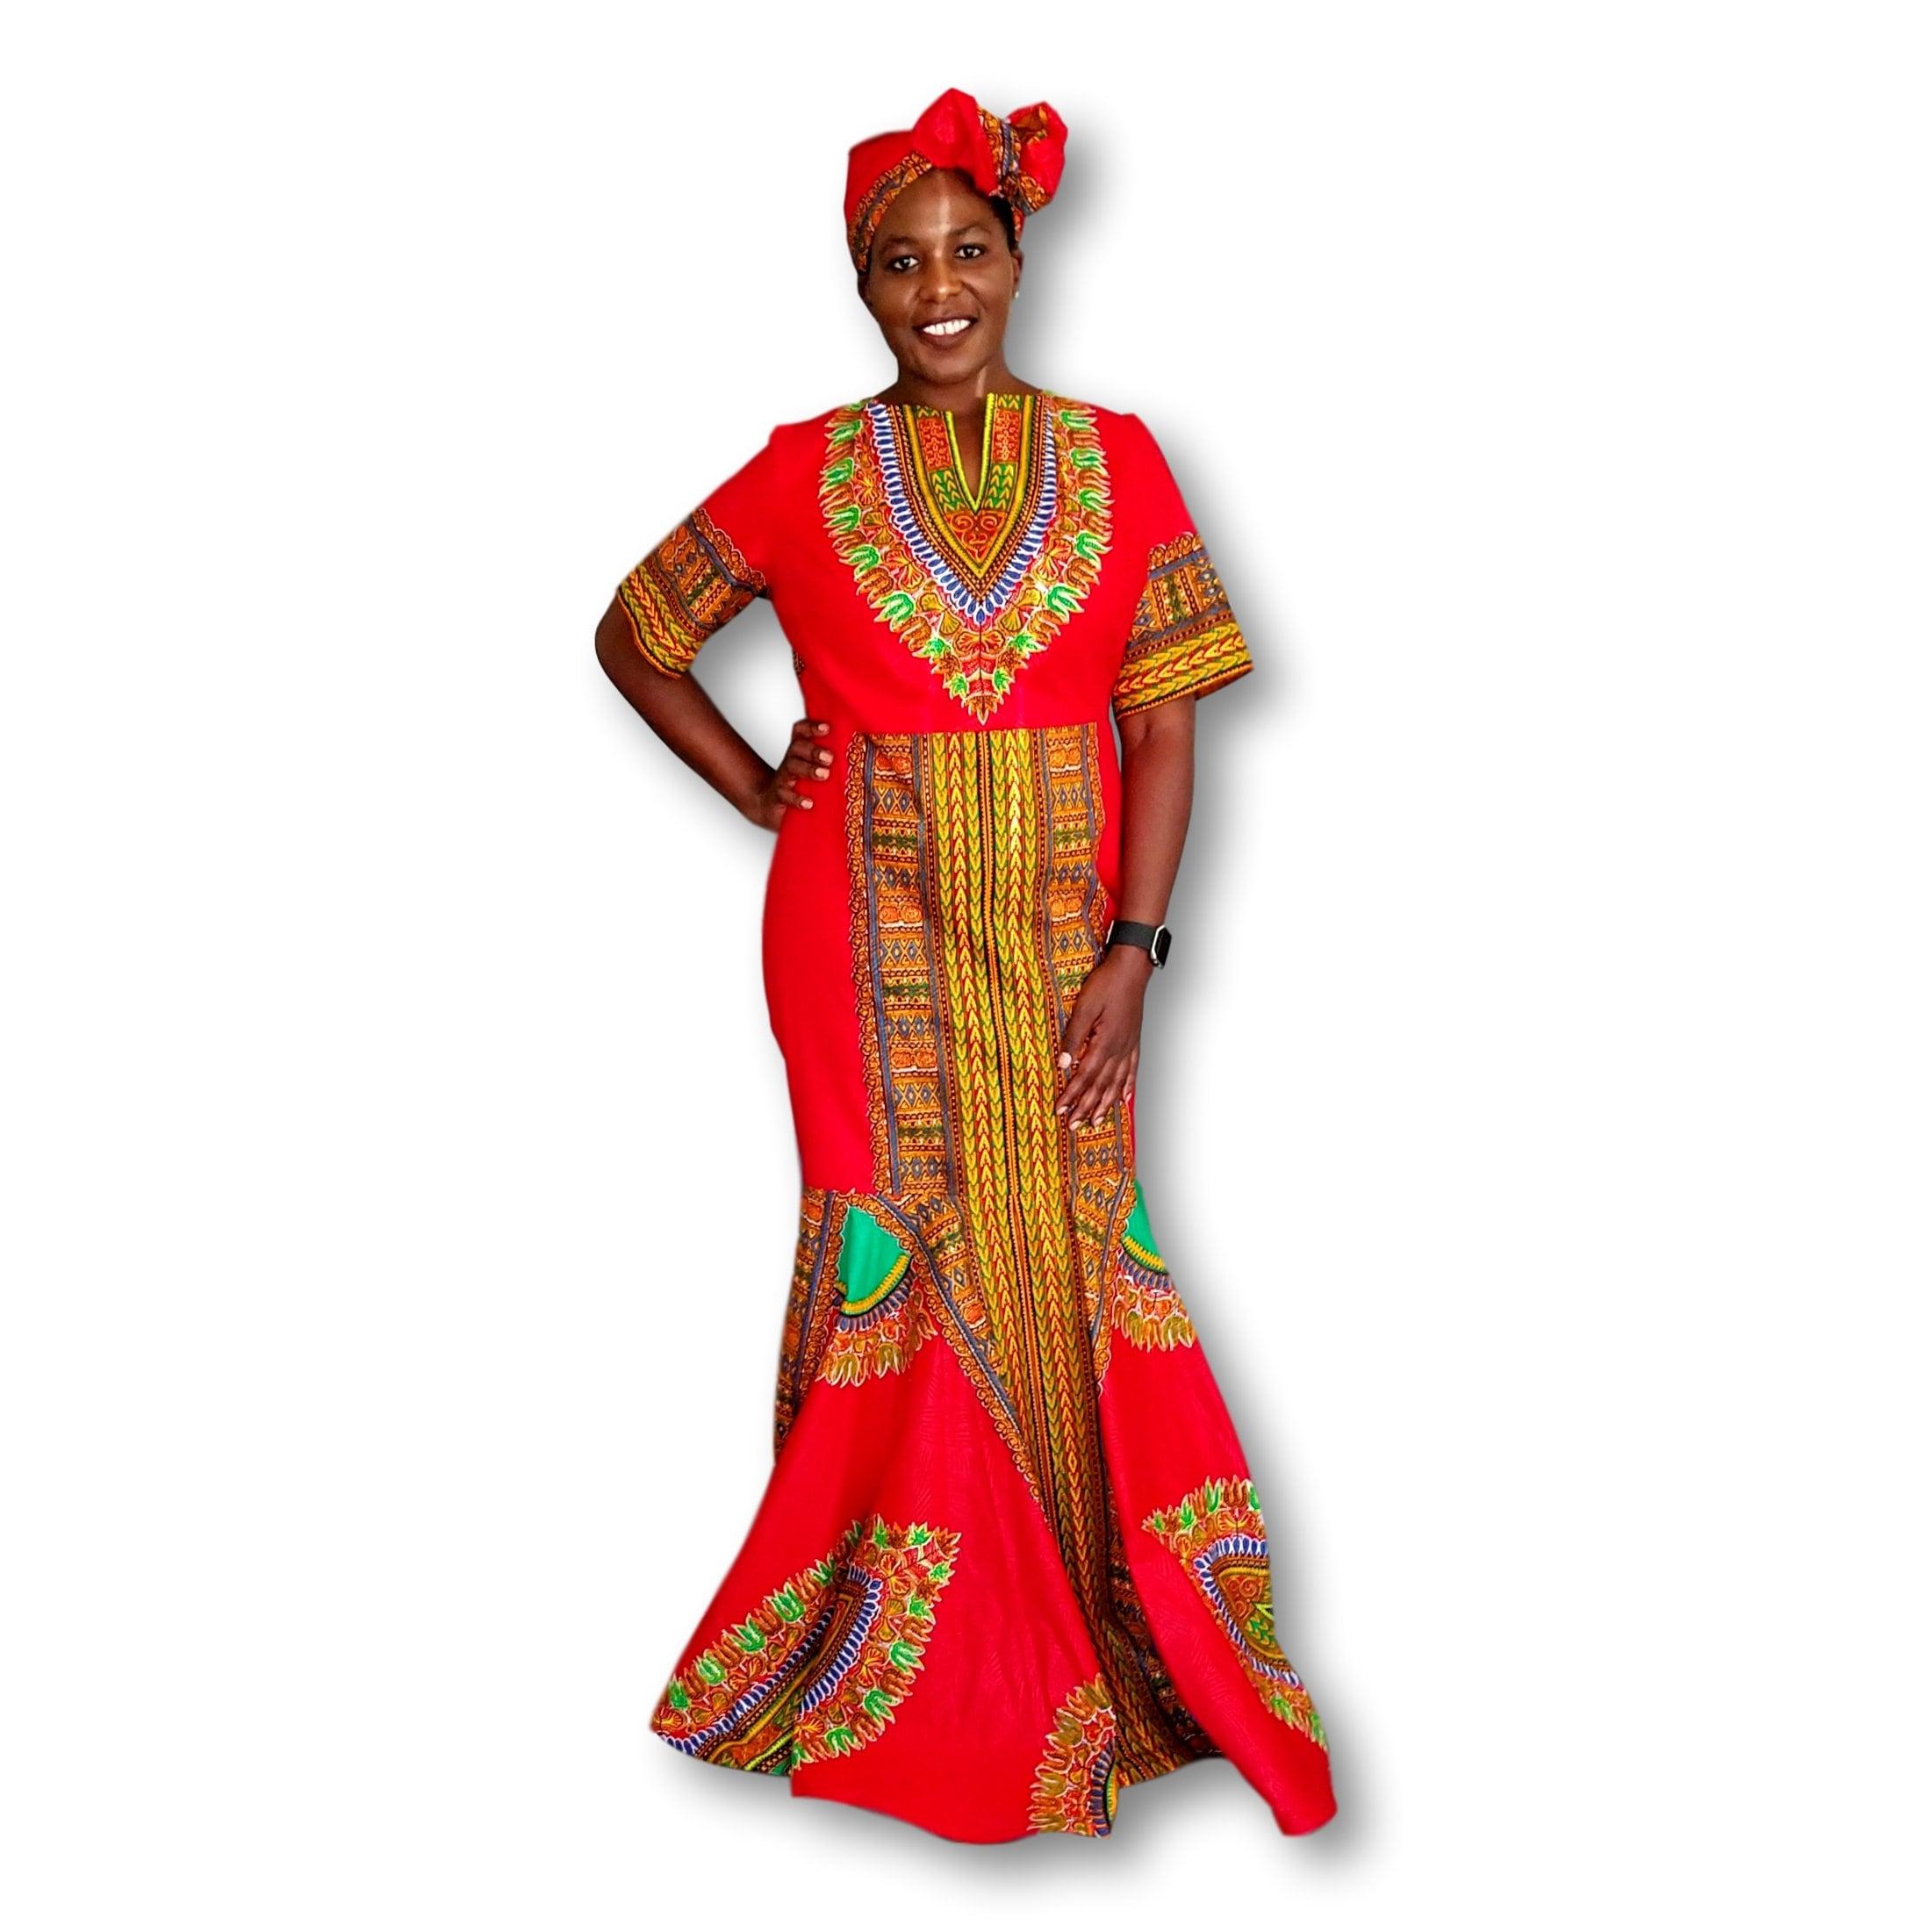 5a35d8a719ea Kuwaha African Print Dashiki Mermaid Gown Dress; Red & Green ...